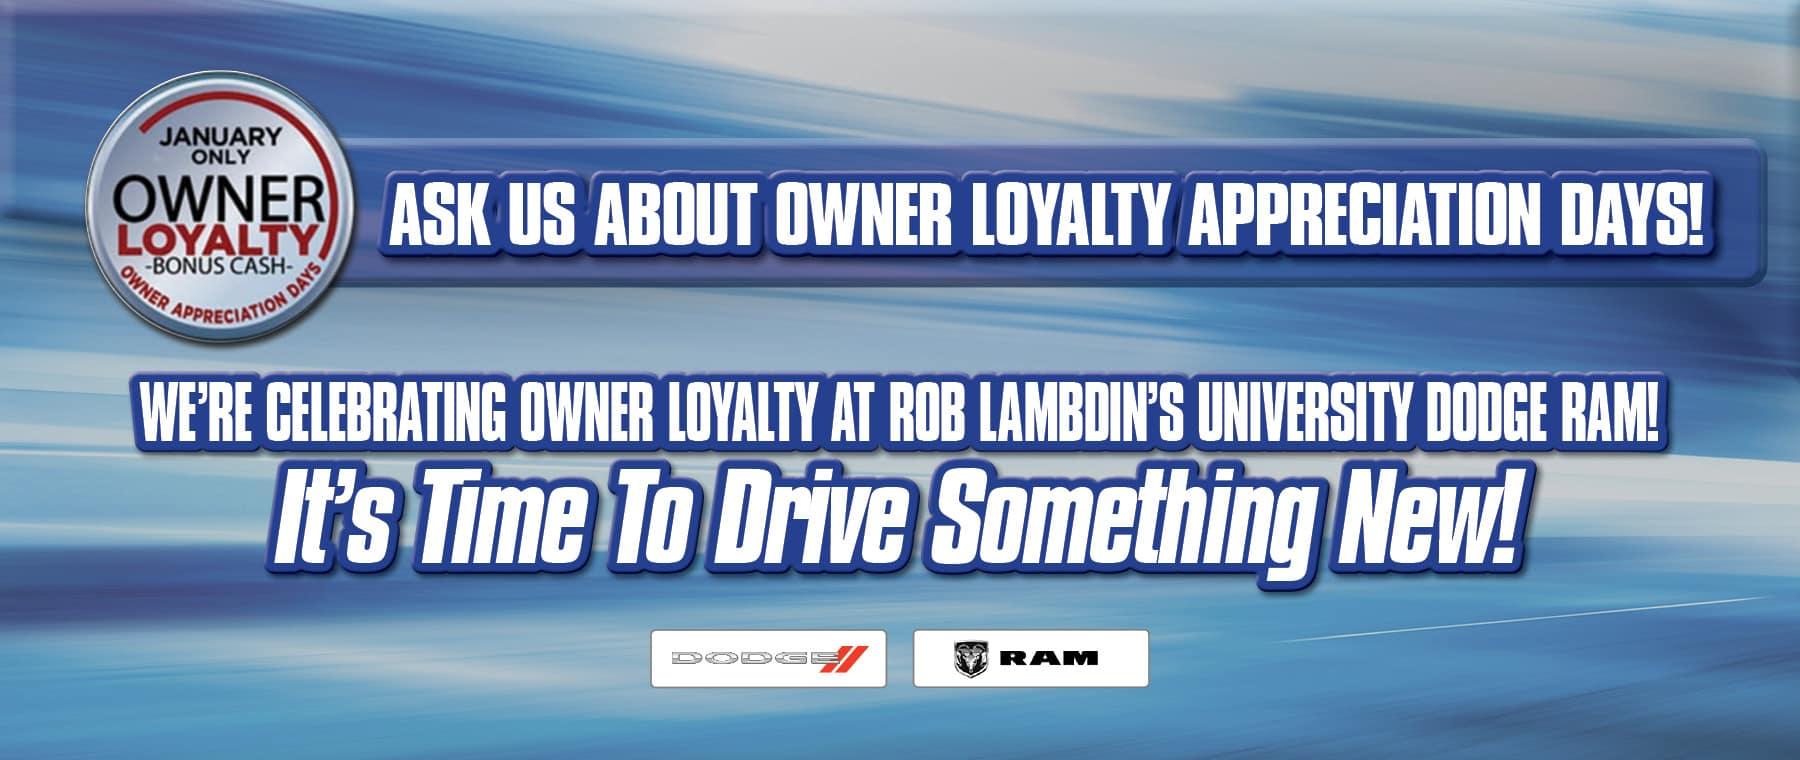 Owner Appreciation Days! - University Dodge RAM!